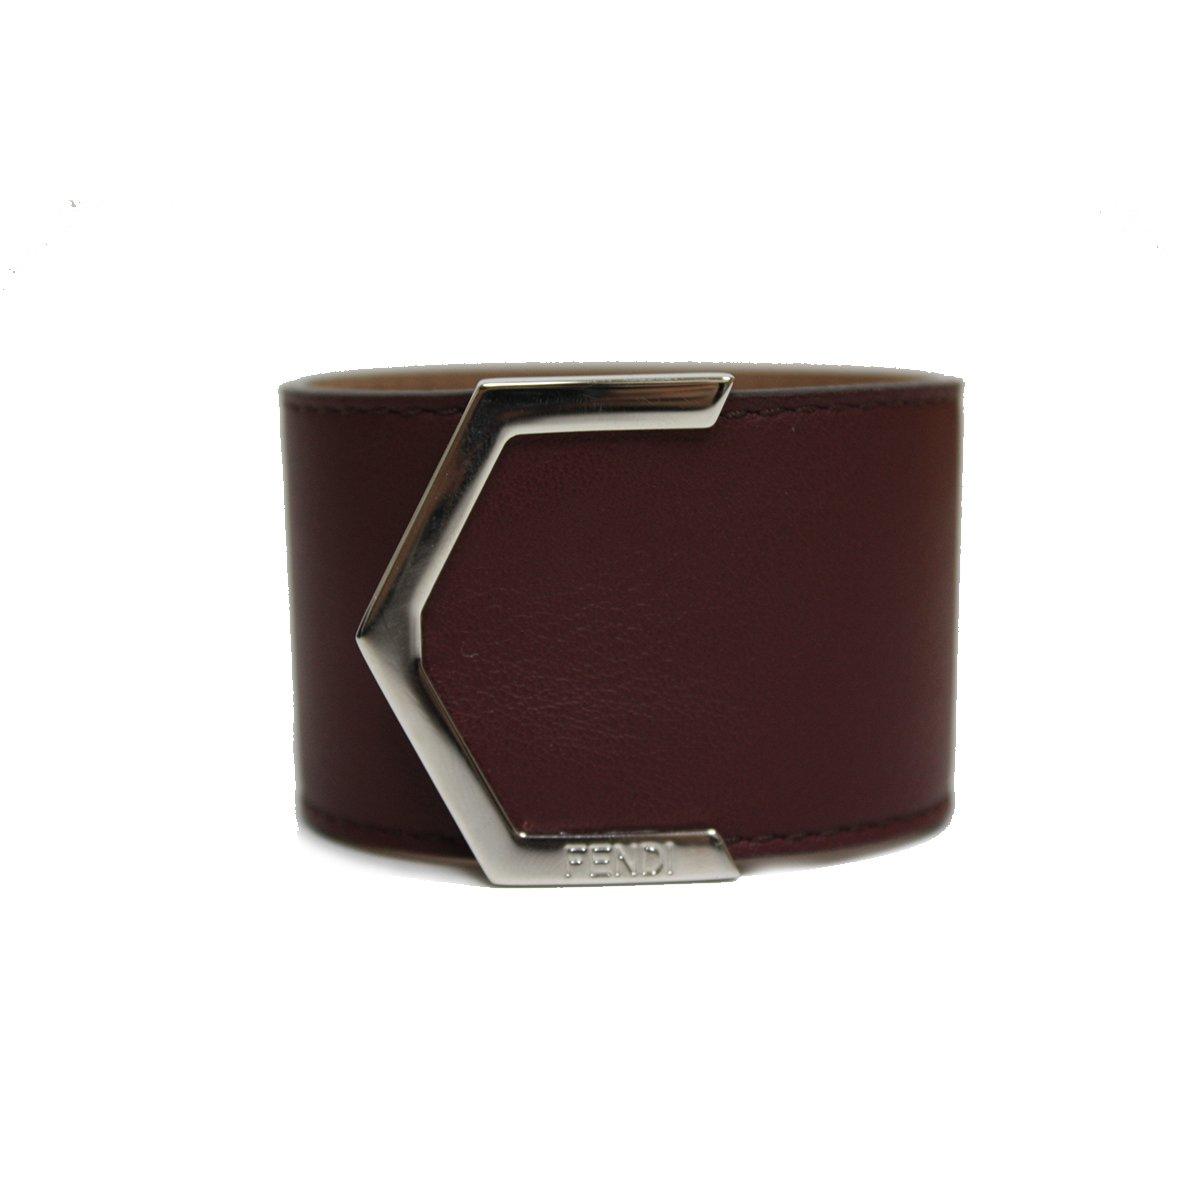 Fendi Leather Burdundy Cuff Bracelet 240015 by Fendi